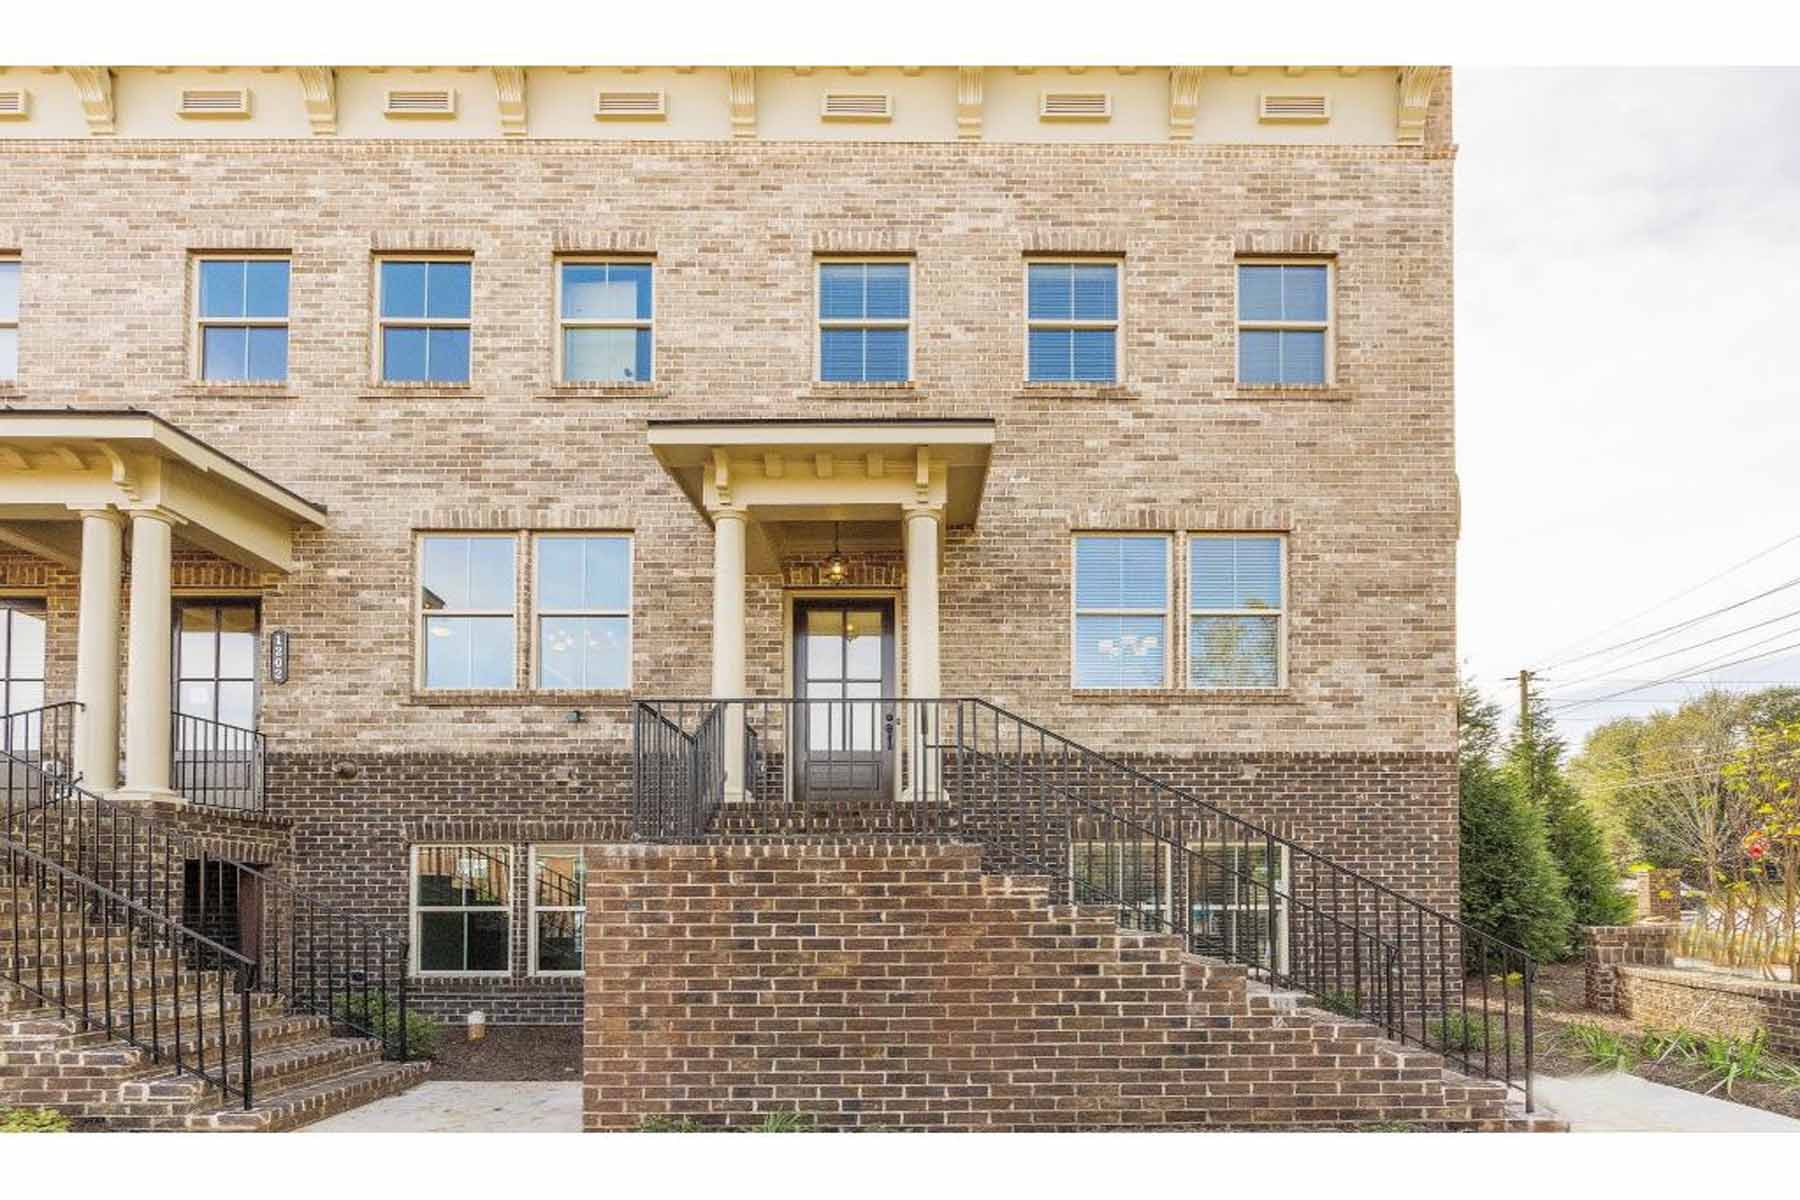 Single Family Home for Sale at Brand New Luxury Townhomes near Emory 891 Briarliff Road NE Unit 309 Atlanta, Georgia, 30306 United States